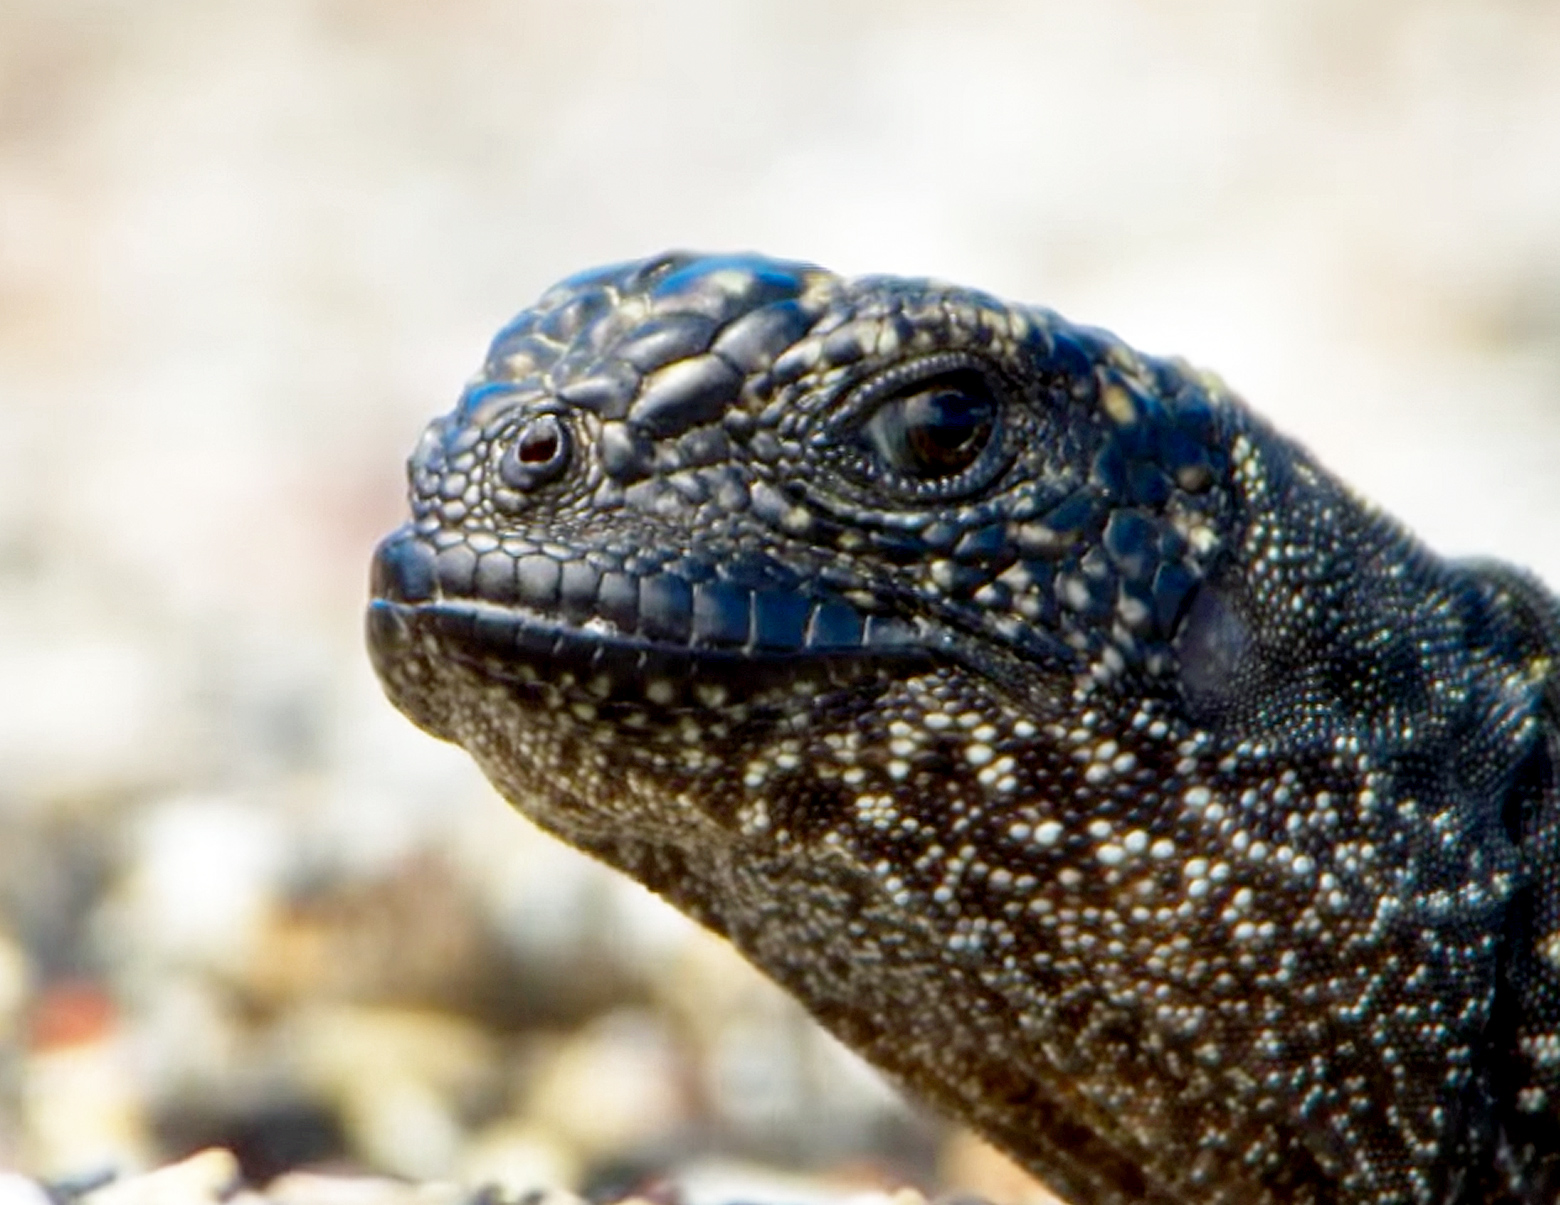 snakes vs iguana